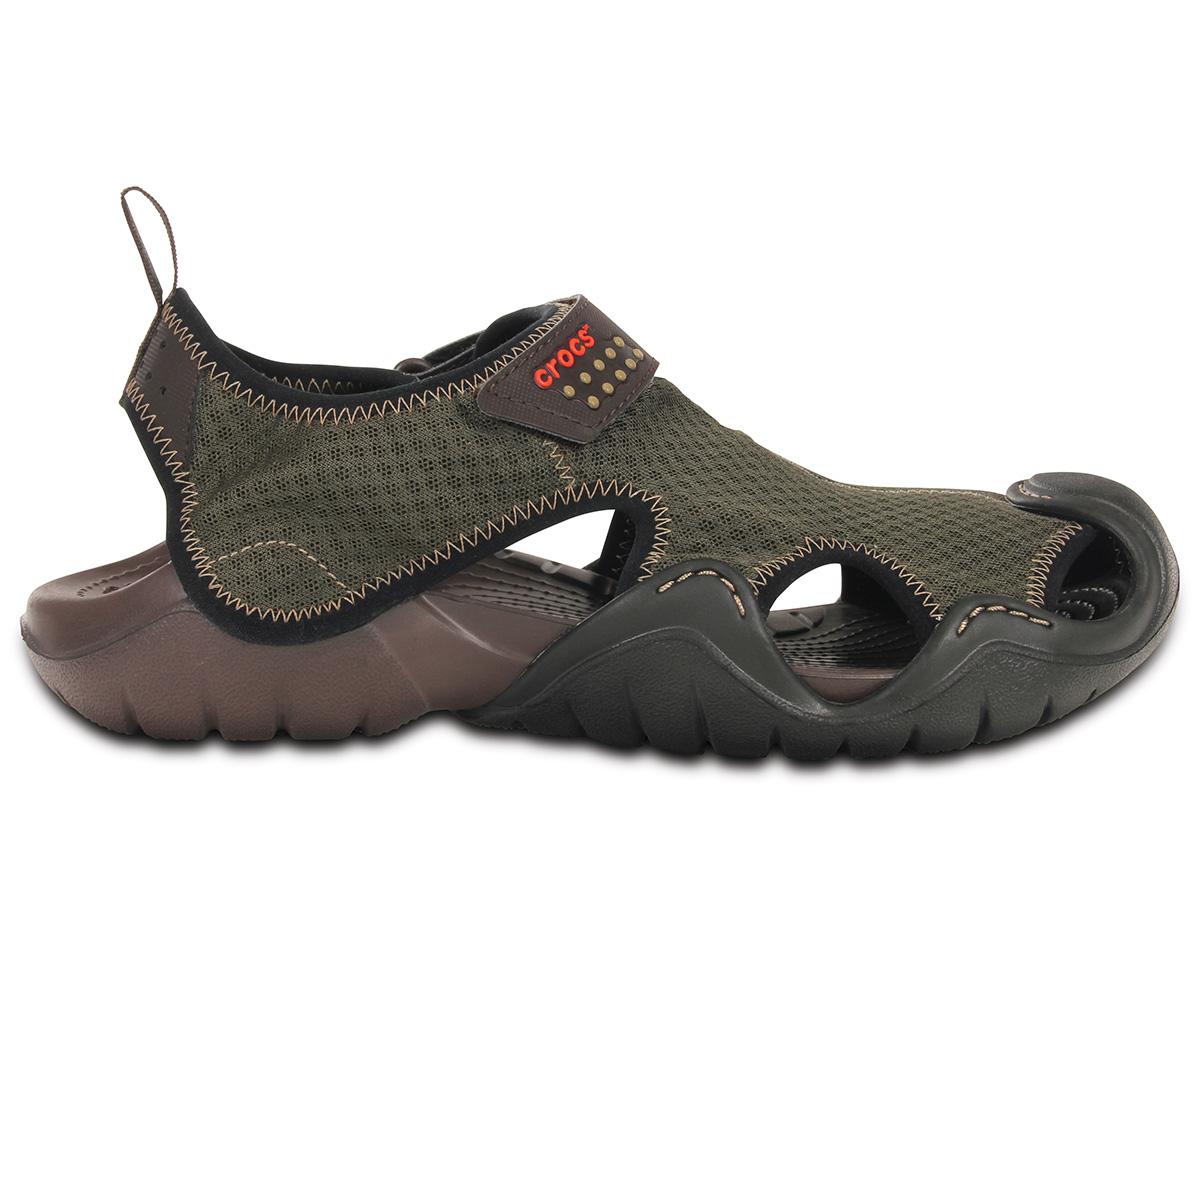 Crocs Swiftwater Sandal M - Espresso/Espresso